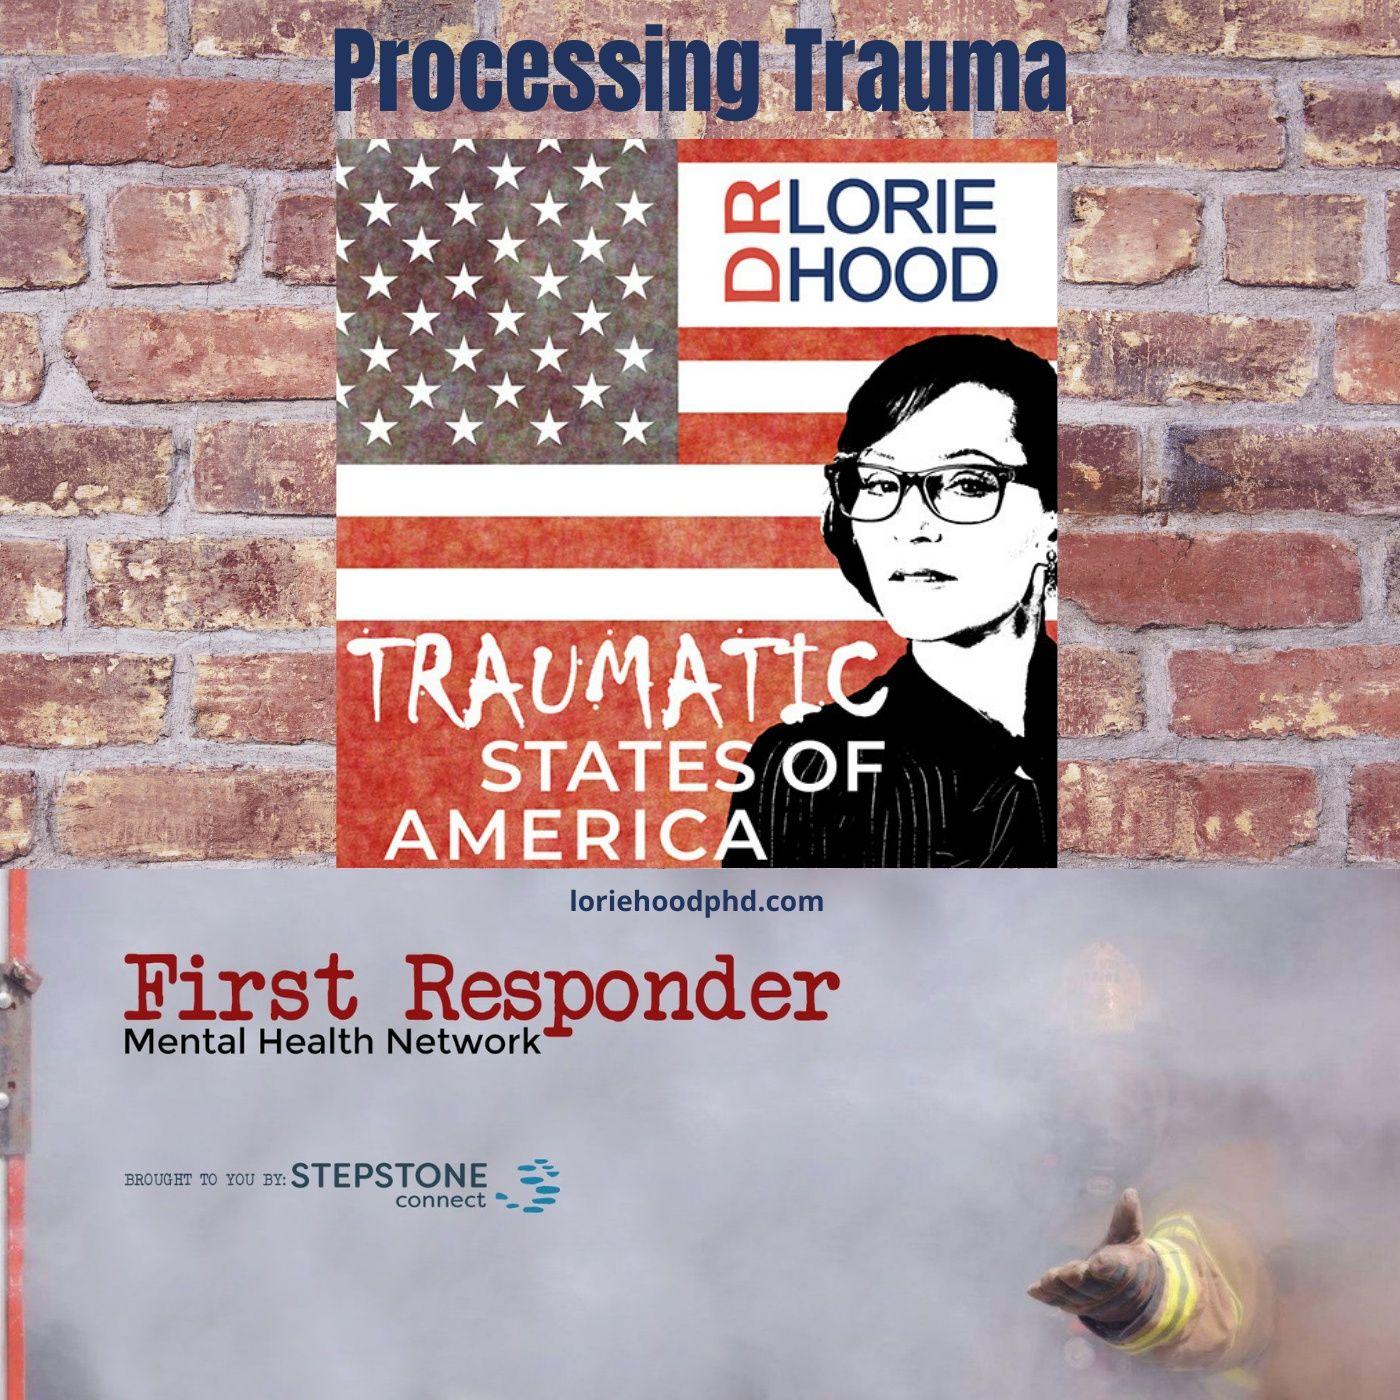 Mental Health News Radio - Processing Trauma with Dr. Lori Hood